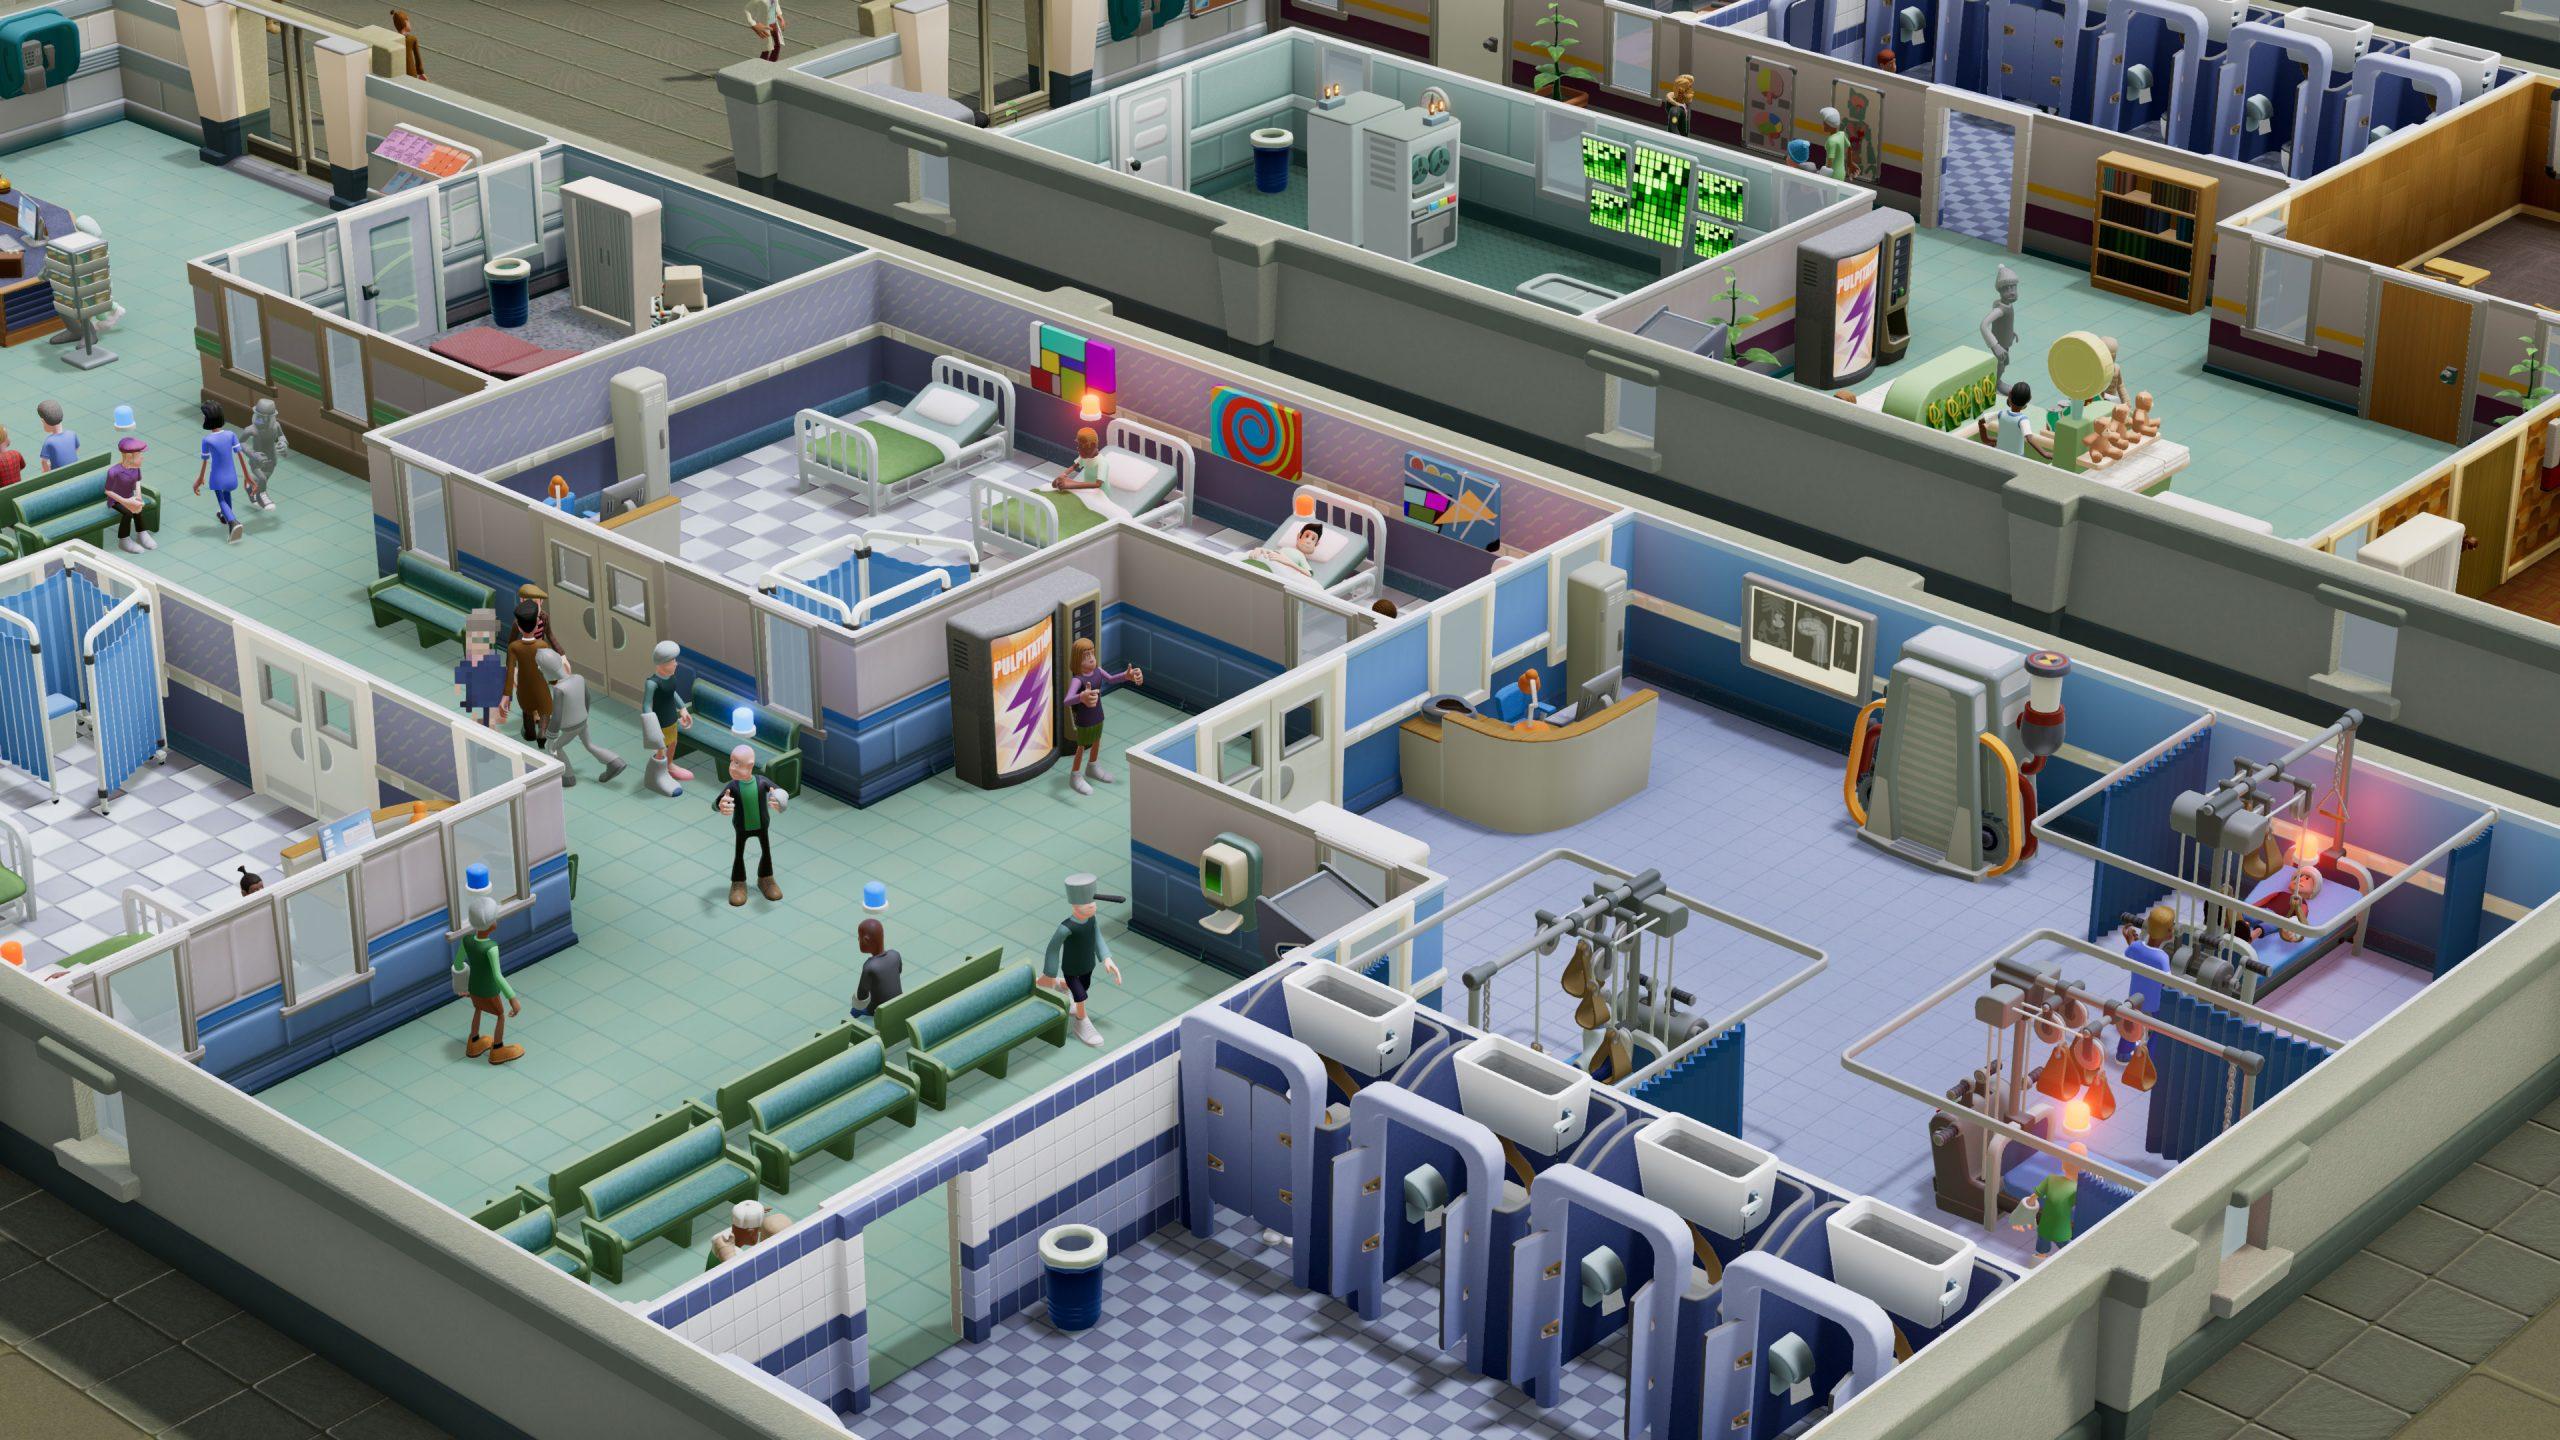 two-point-hospital-jumbo-edition-3